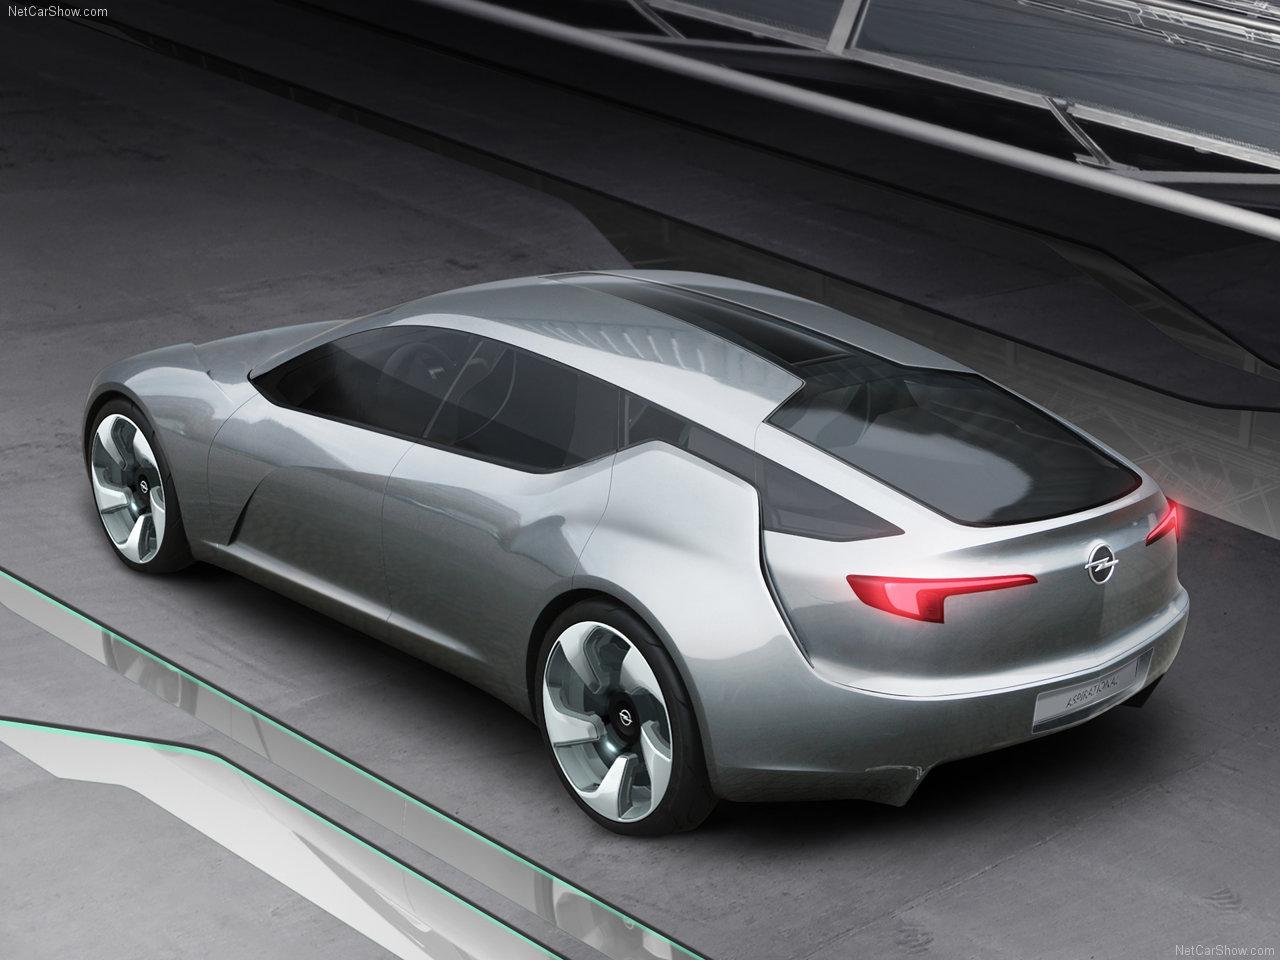 http://1.bp.blogspot.com/_lsyt_wQ2awY/TDtDlnPNIJI/AAAAAAAB-CY/lS_OJnrwY4g/s1600/Opel-Flextreme_GT-E_Concept_2010_1280x960_wallpaper_03.jpg